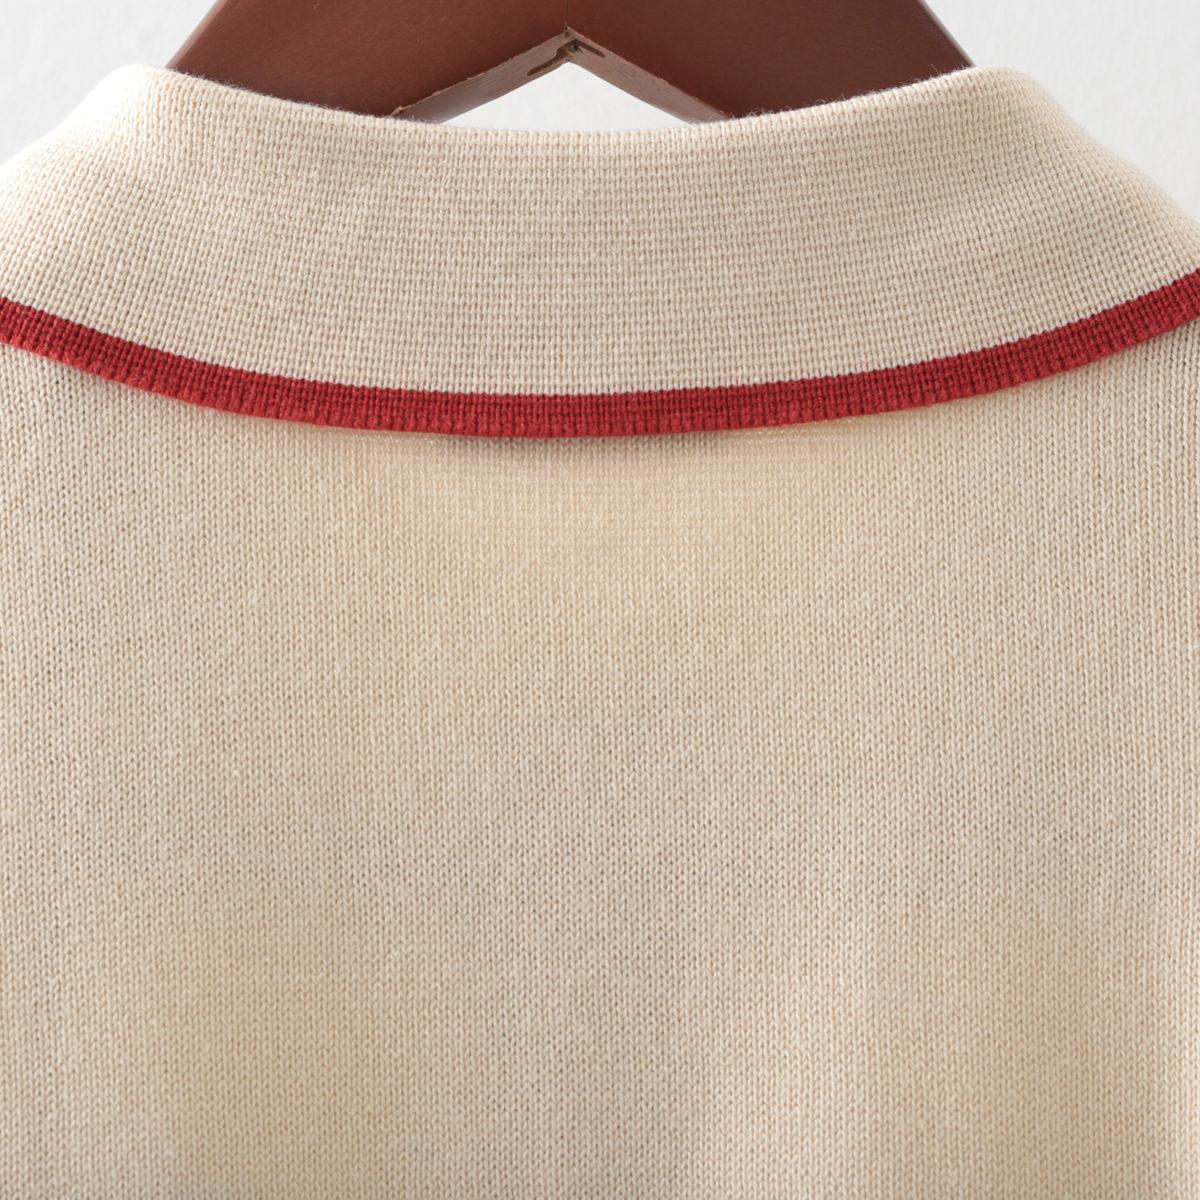 Gabicci メンズ ポロシャツ ポロ ティップライン ガビッチ 5色 コロン エルム ネイビー オート ホワイト レトロ モッズファッション